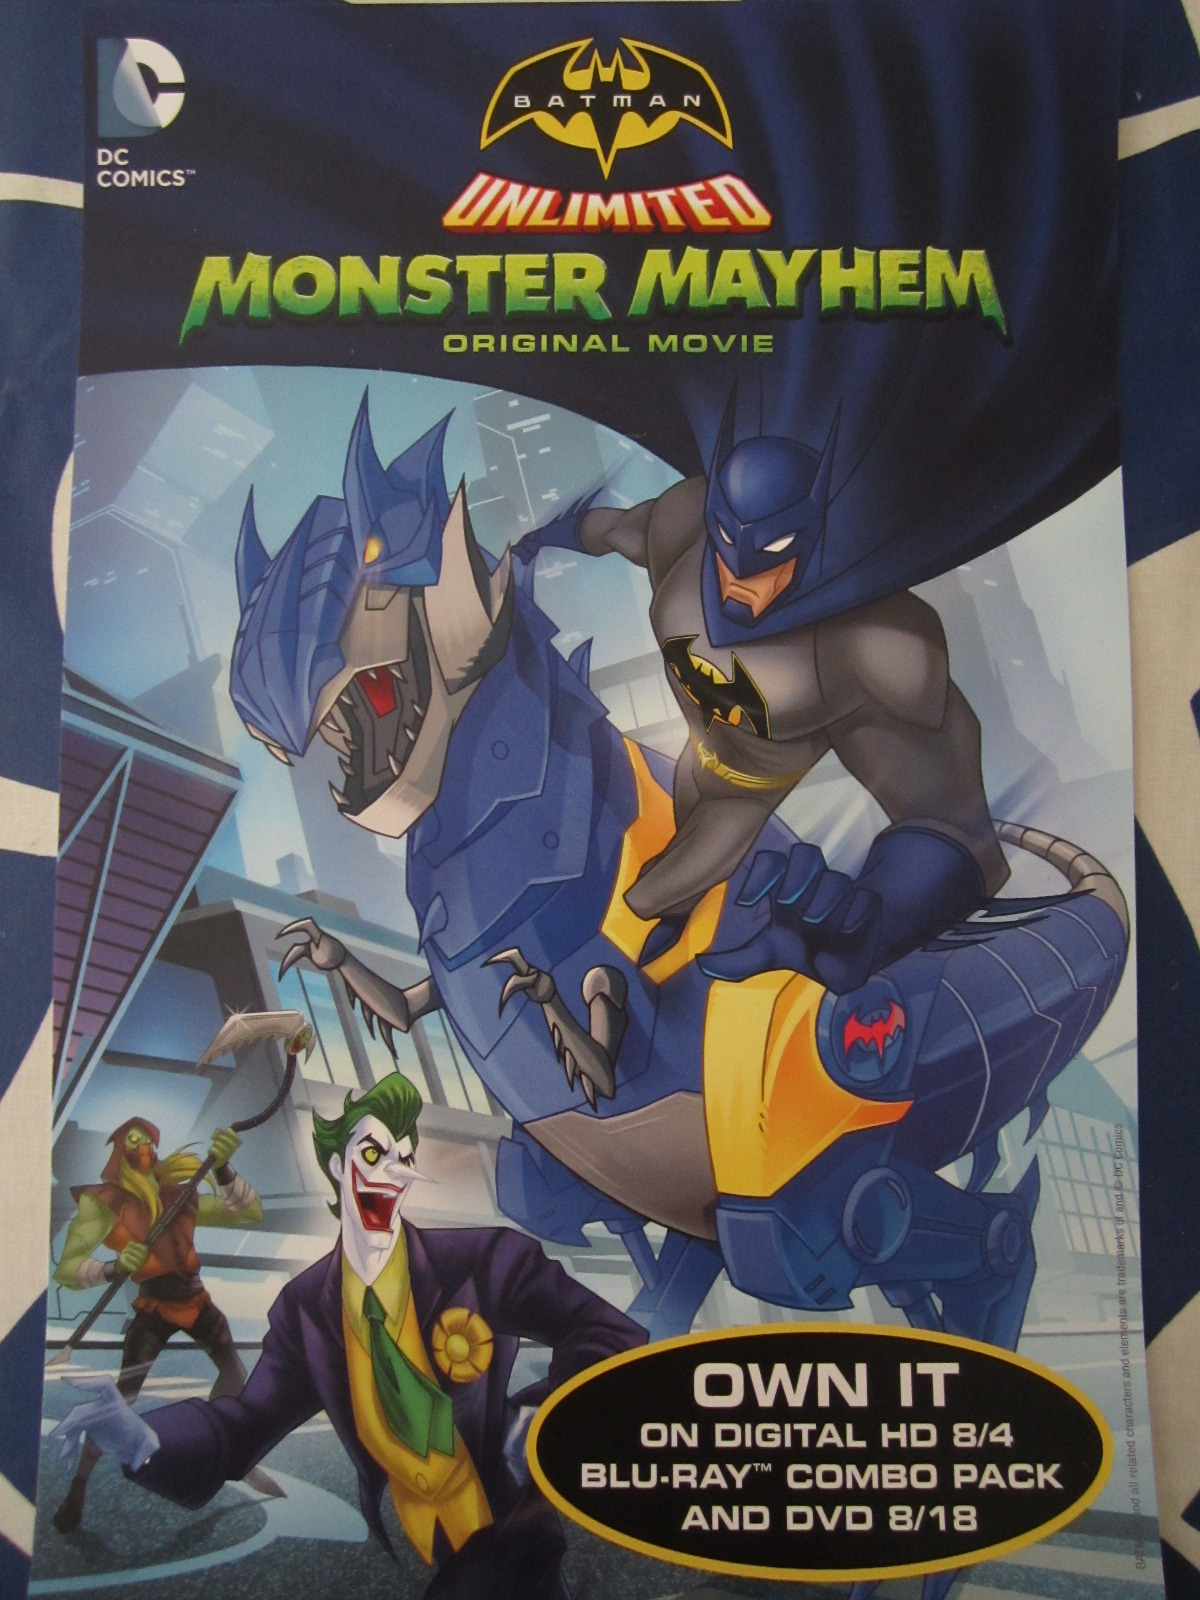 1200x1600 > Batman Unlimited: Monster Mayhem Wallpapers